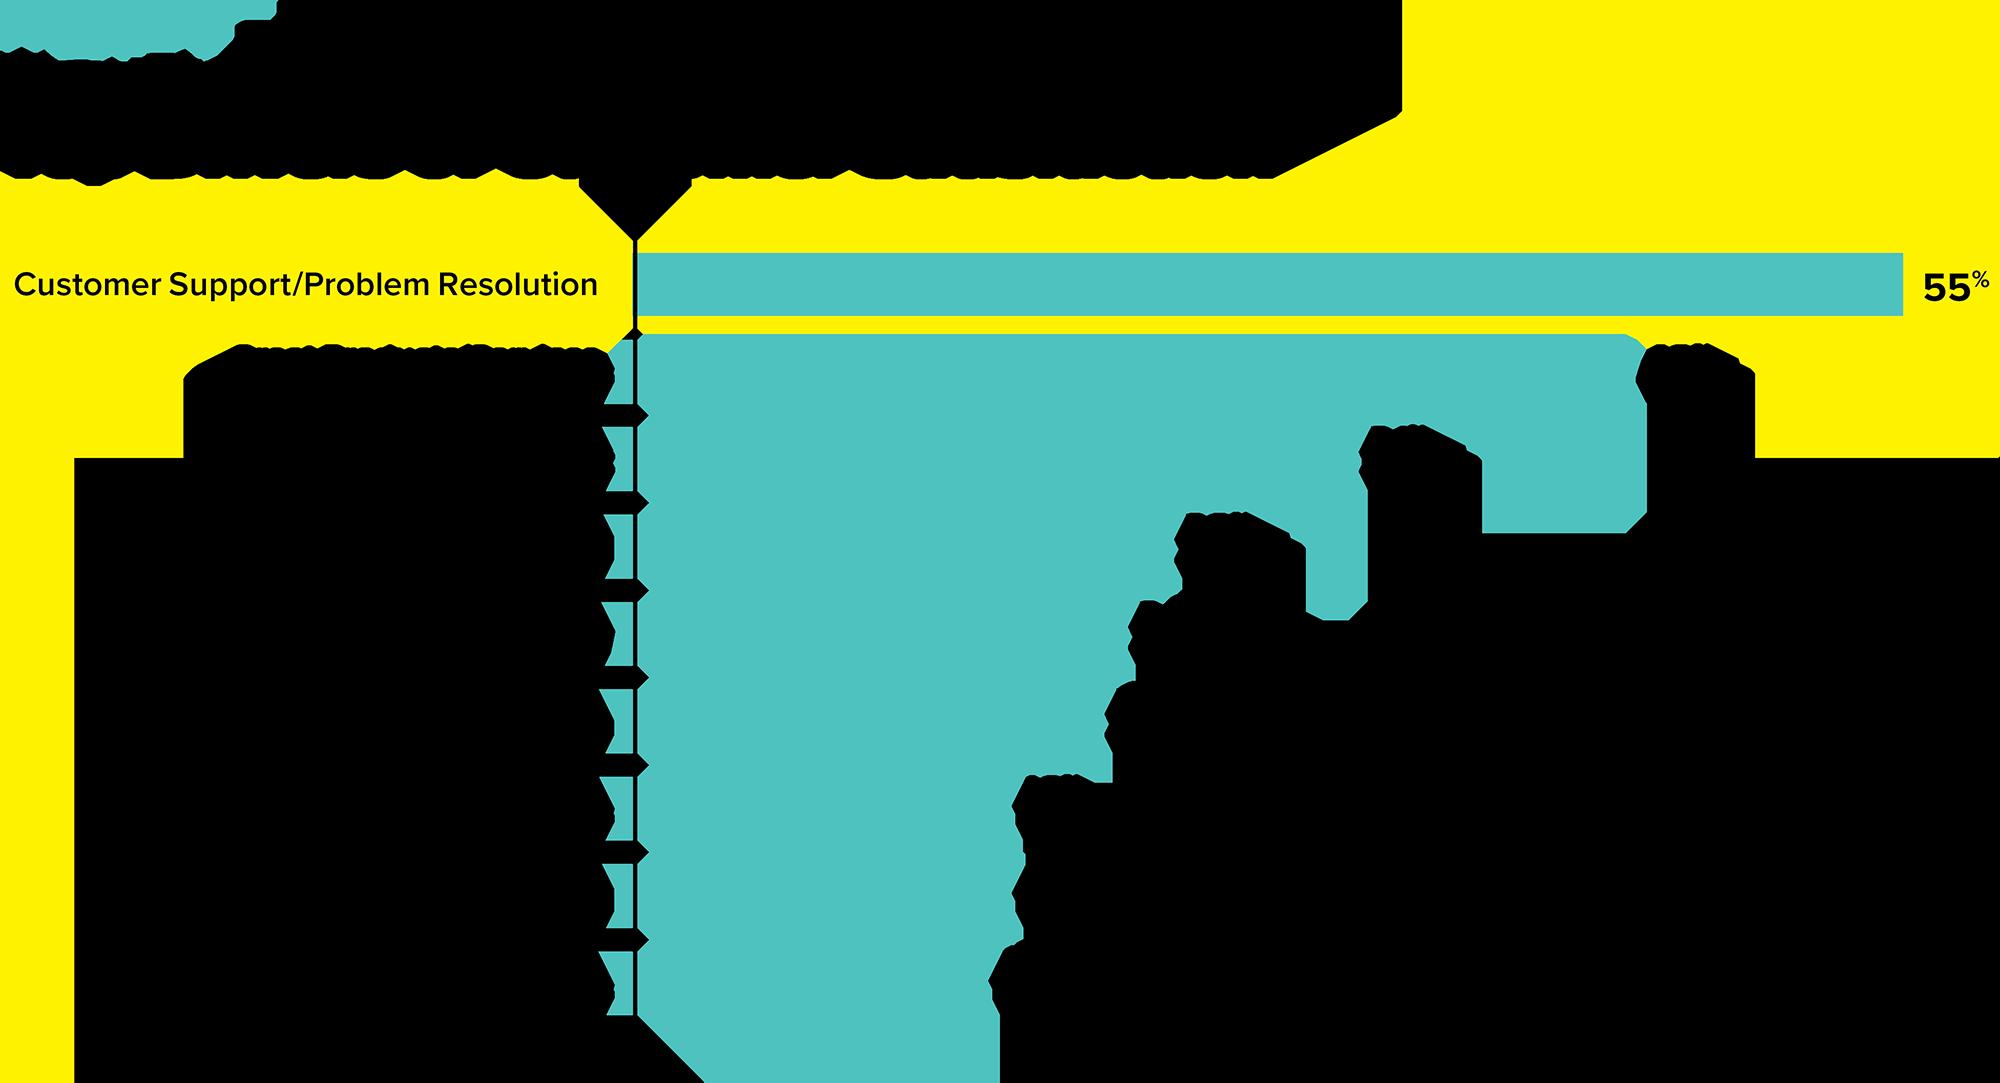 Top Drivers of Customer Satisfaction